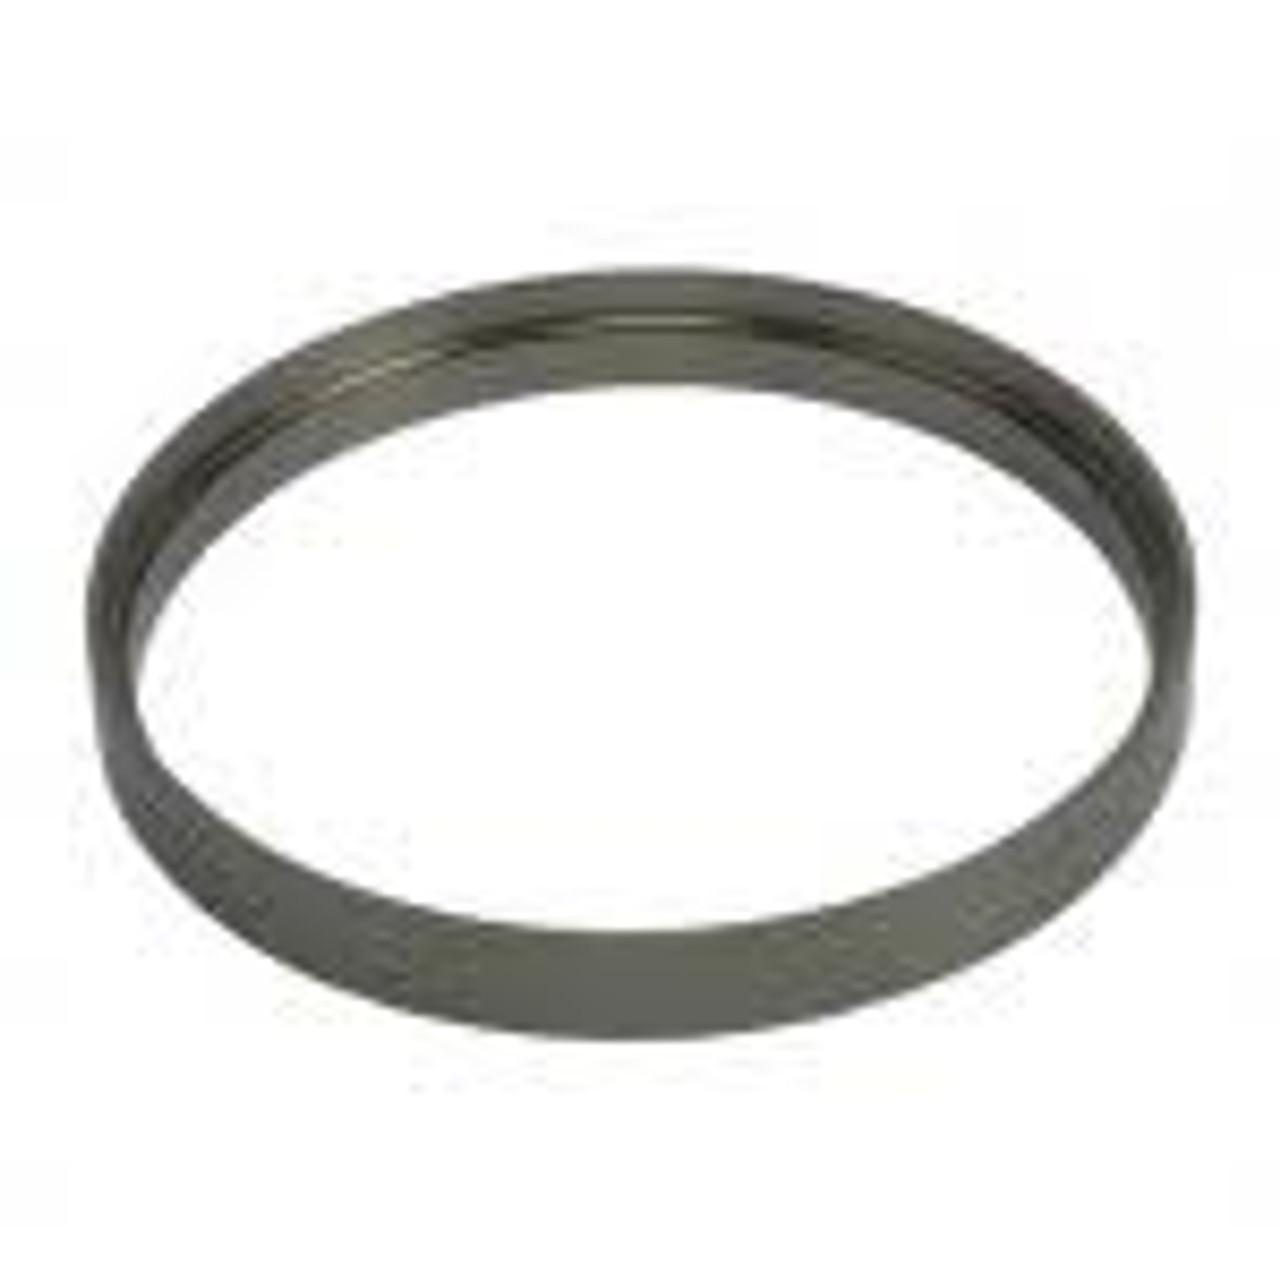 Standard Upper Counter Bore Ring - LAS8065-6